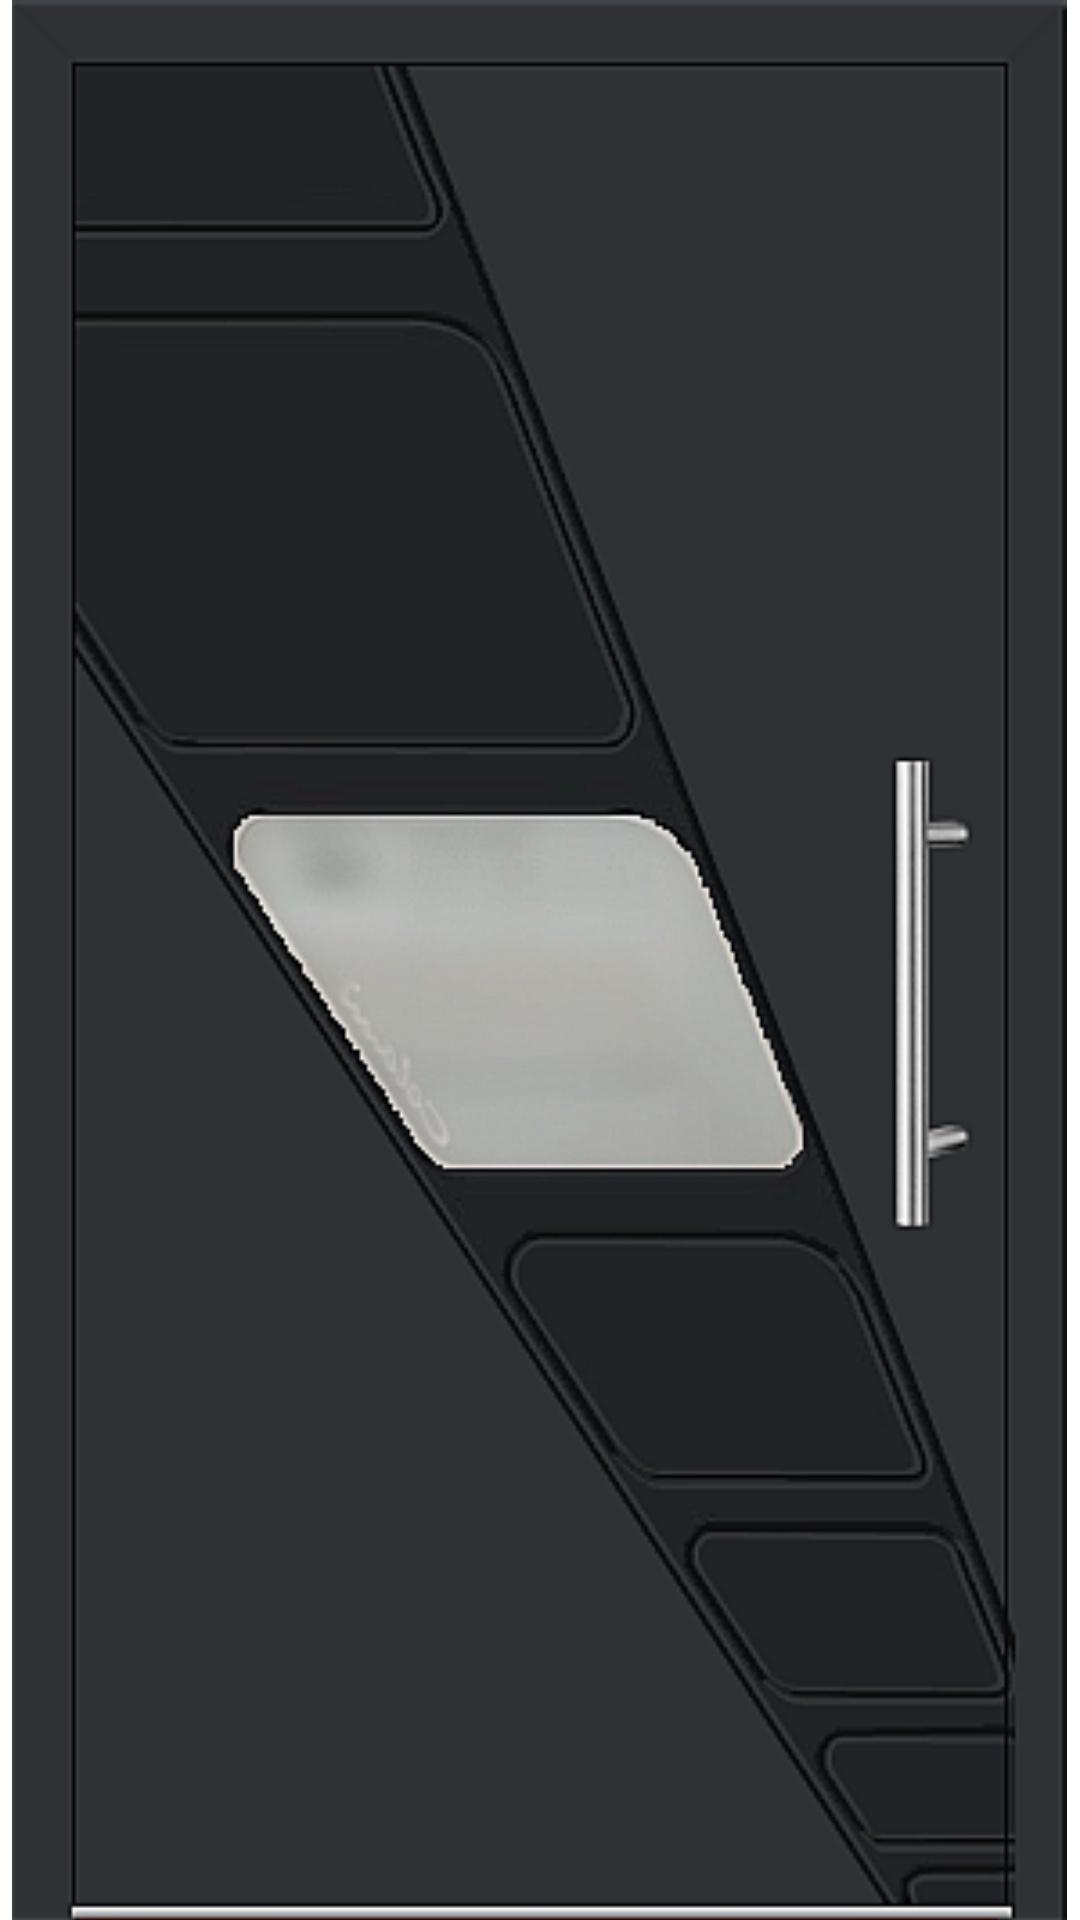 Aluminium Haustür Modell 6994-41 schwarz